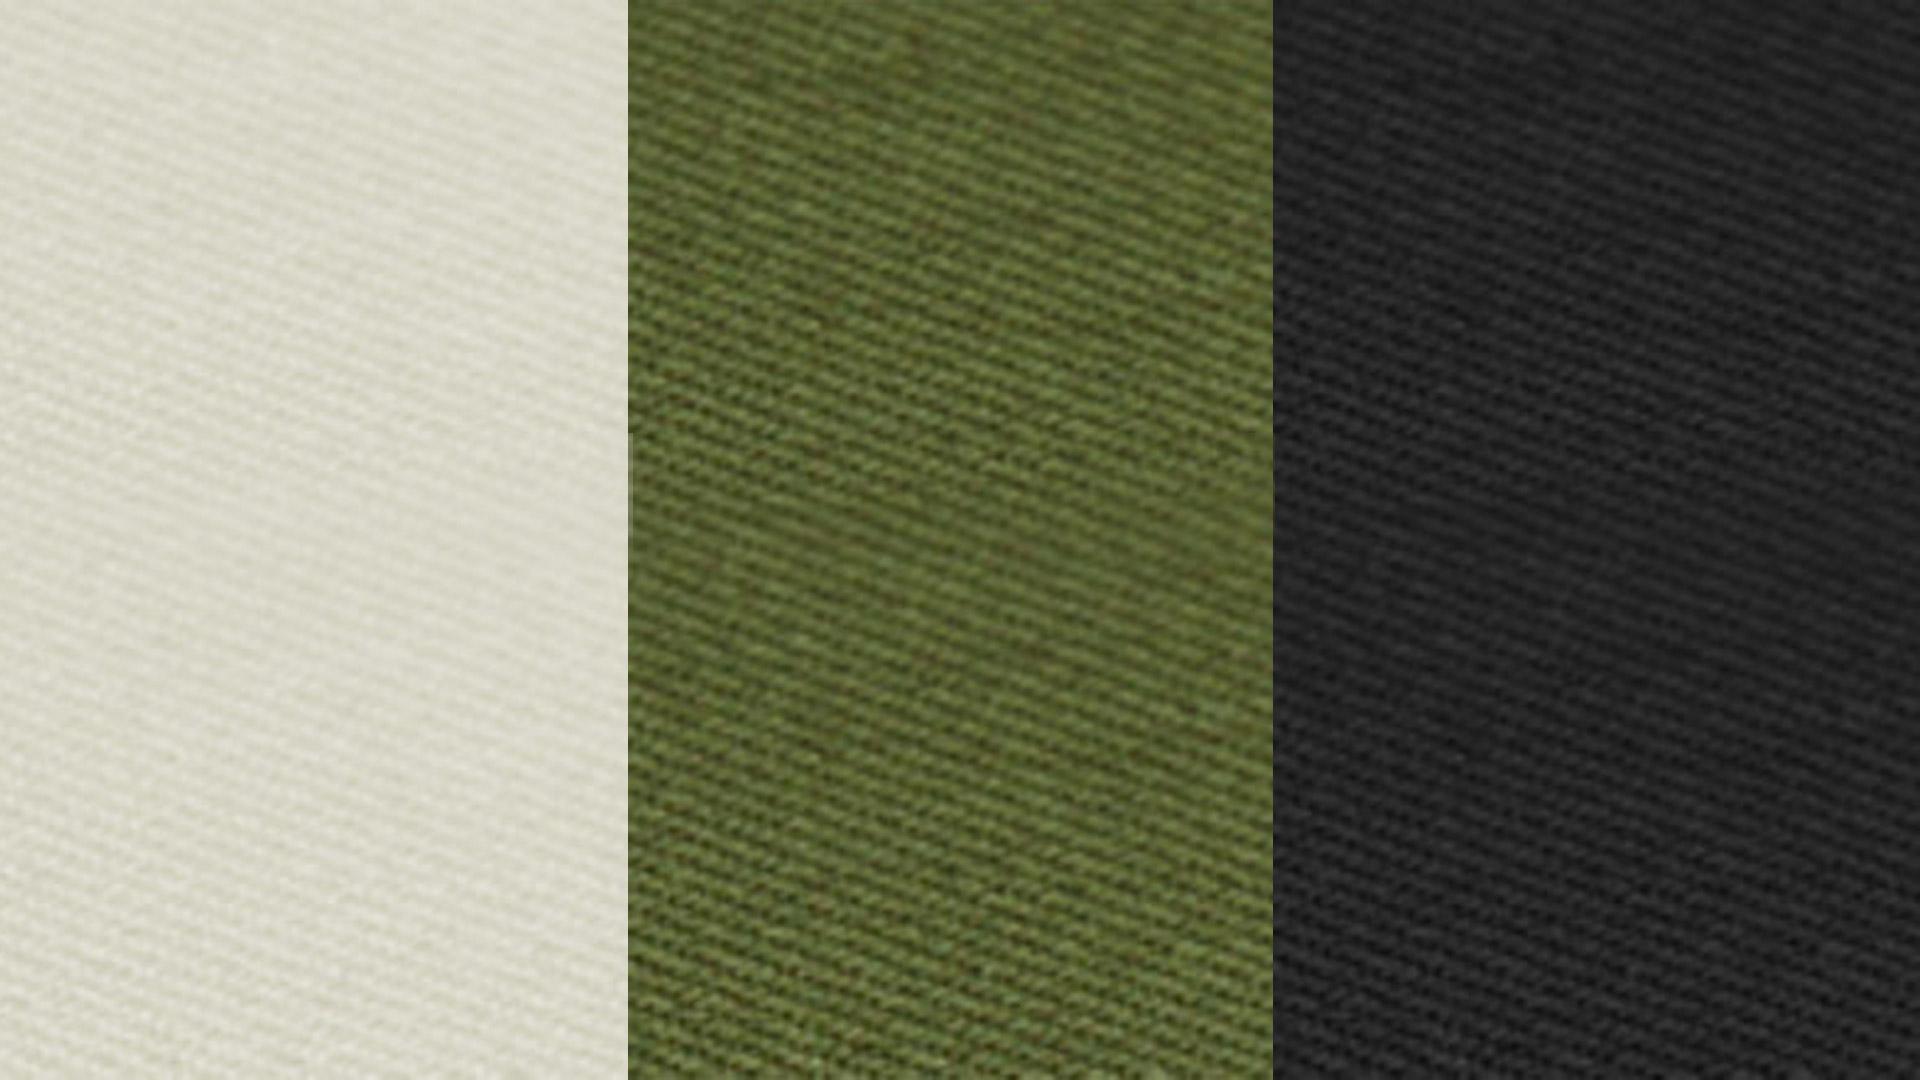 abziehbarer futon bezug f r futon schlafsofa nigiri. Black Bedroom Furniture Sets. Home Design Ideas